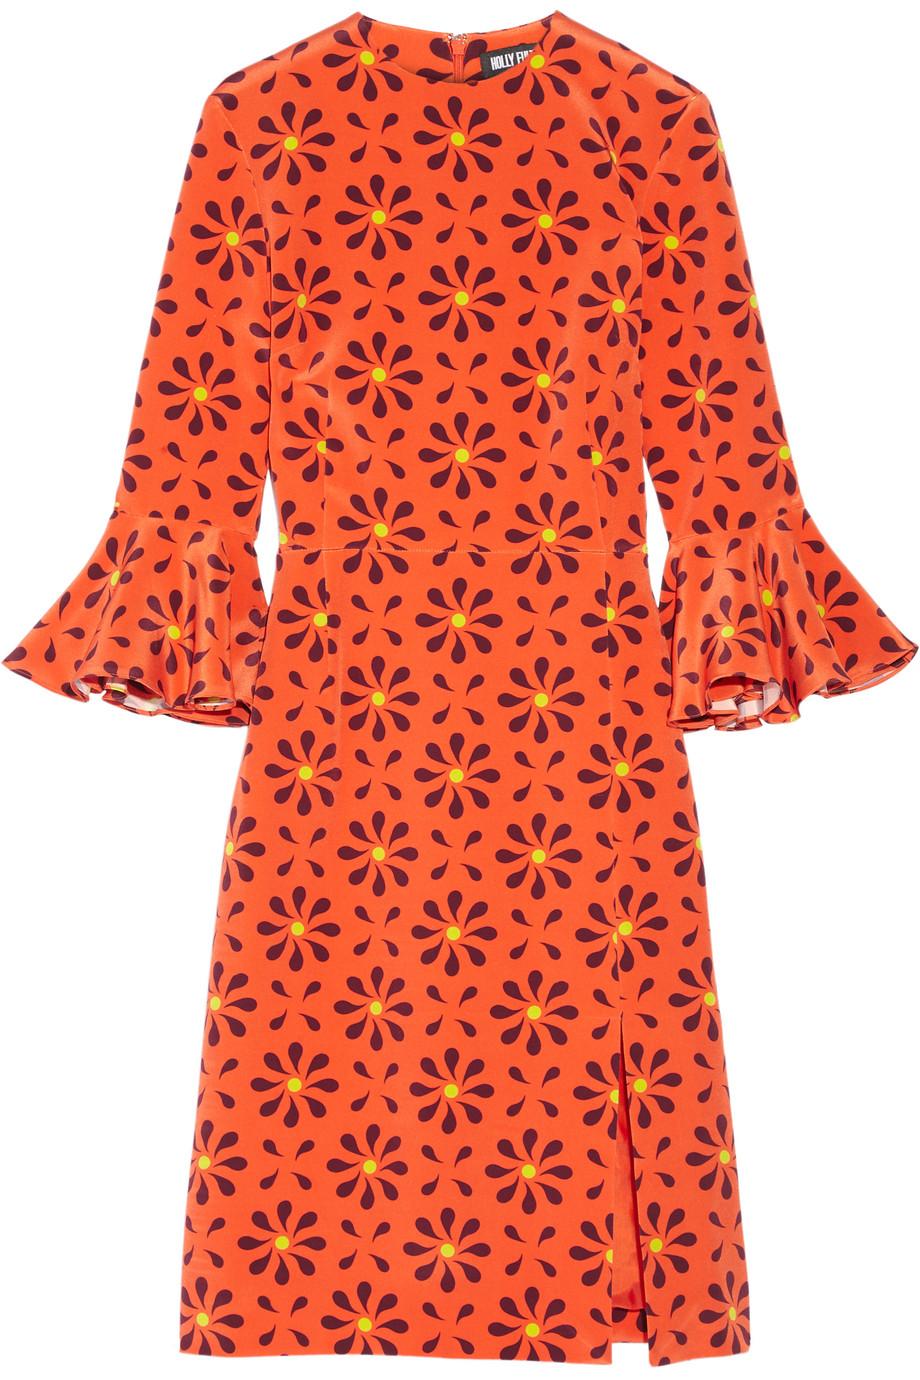 Holly Fulton Irina Printed Ruffle-Trimmed Silk Crepe De Chine Dress, Orange, Women's, Size: 12